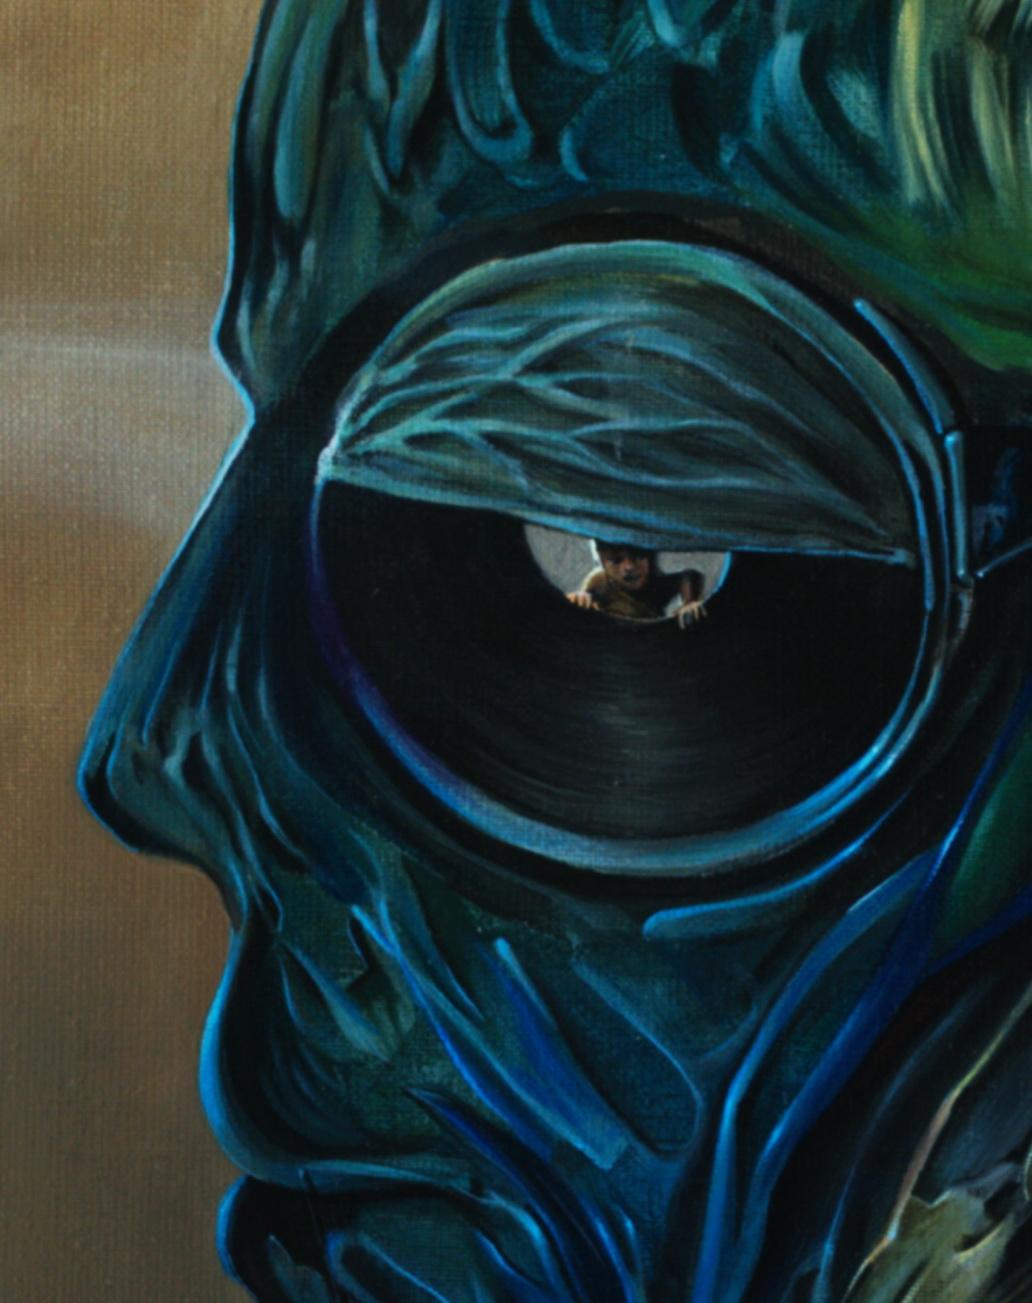 ART_paint_Nie_uciekniesz_02